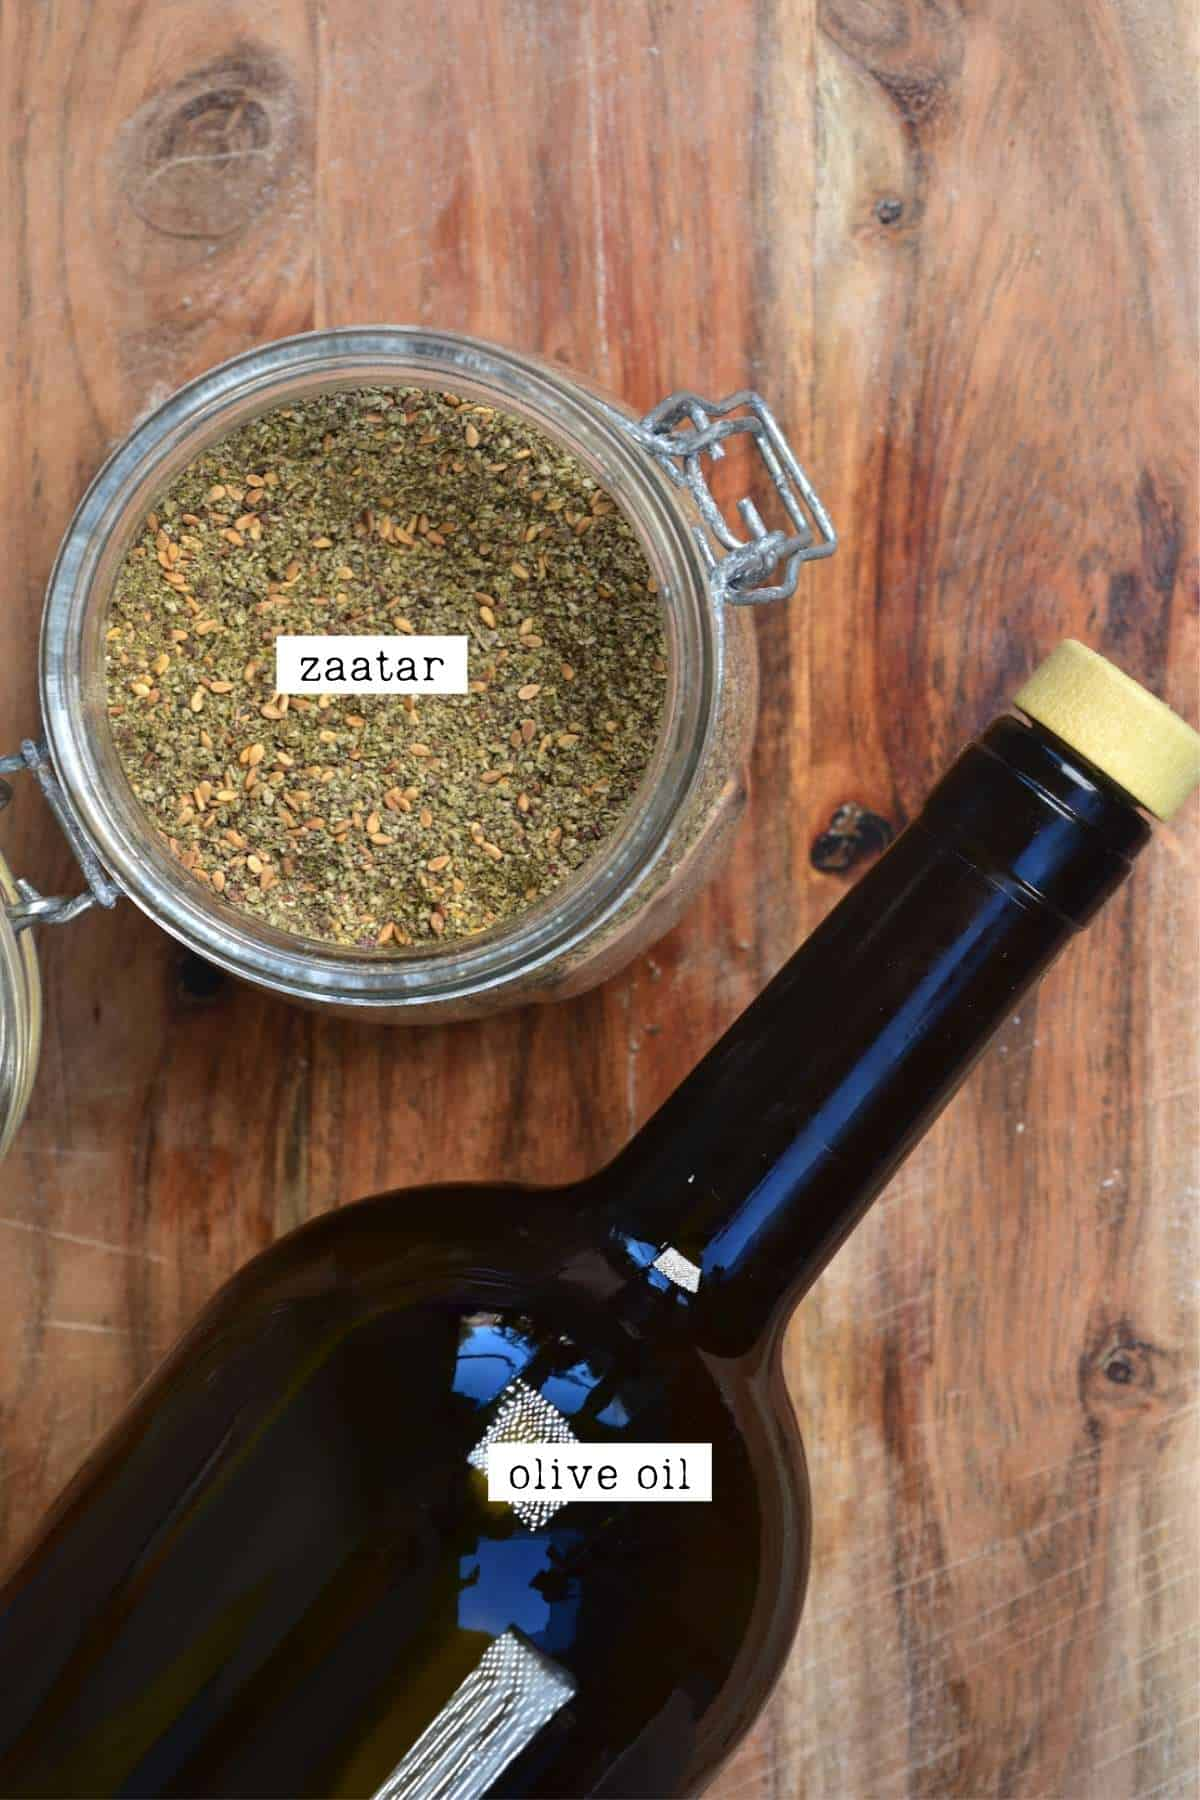 Zaatar and olive oil